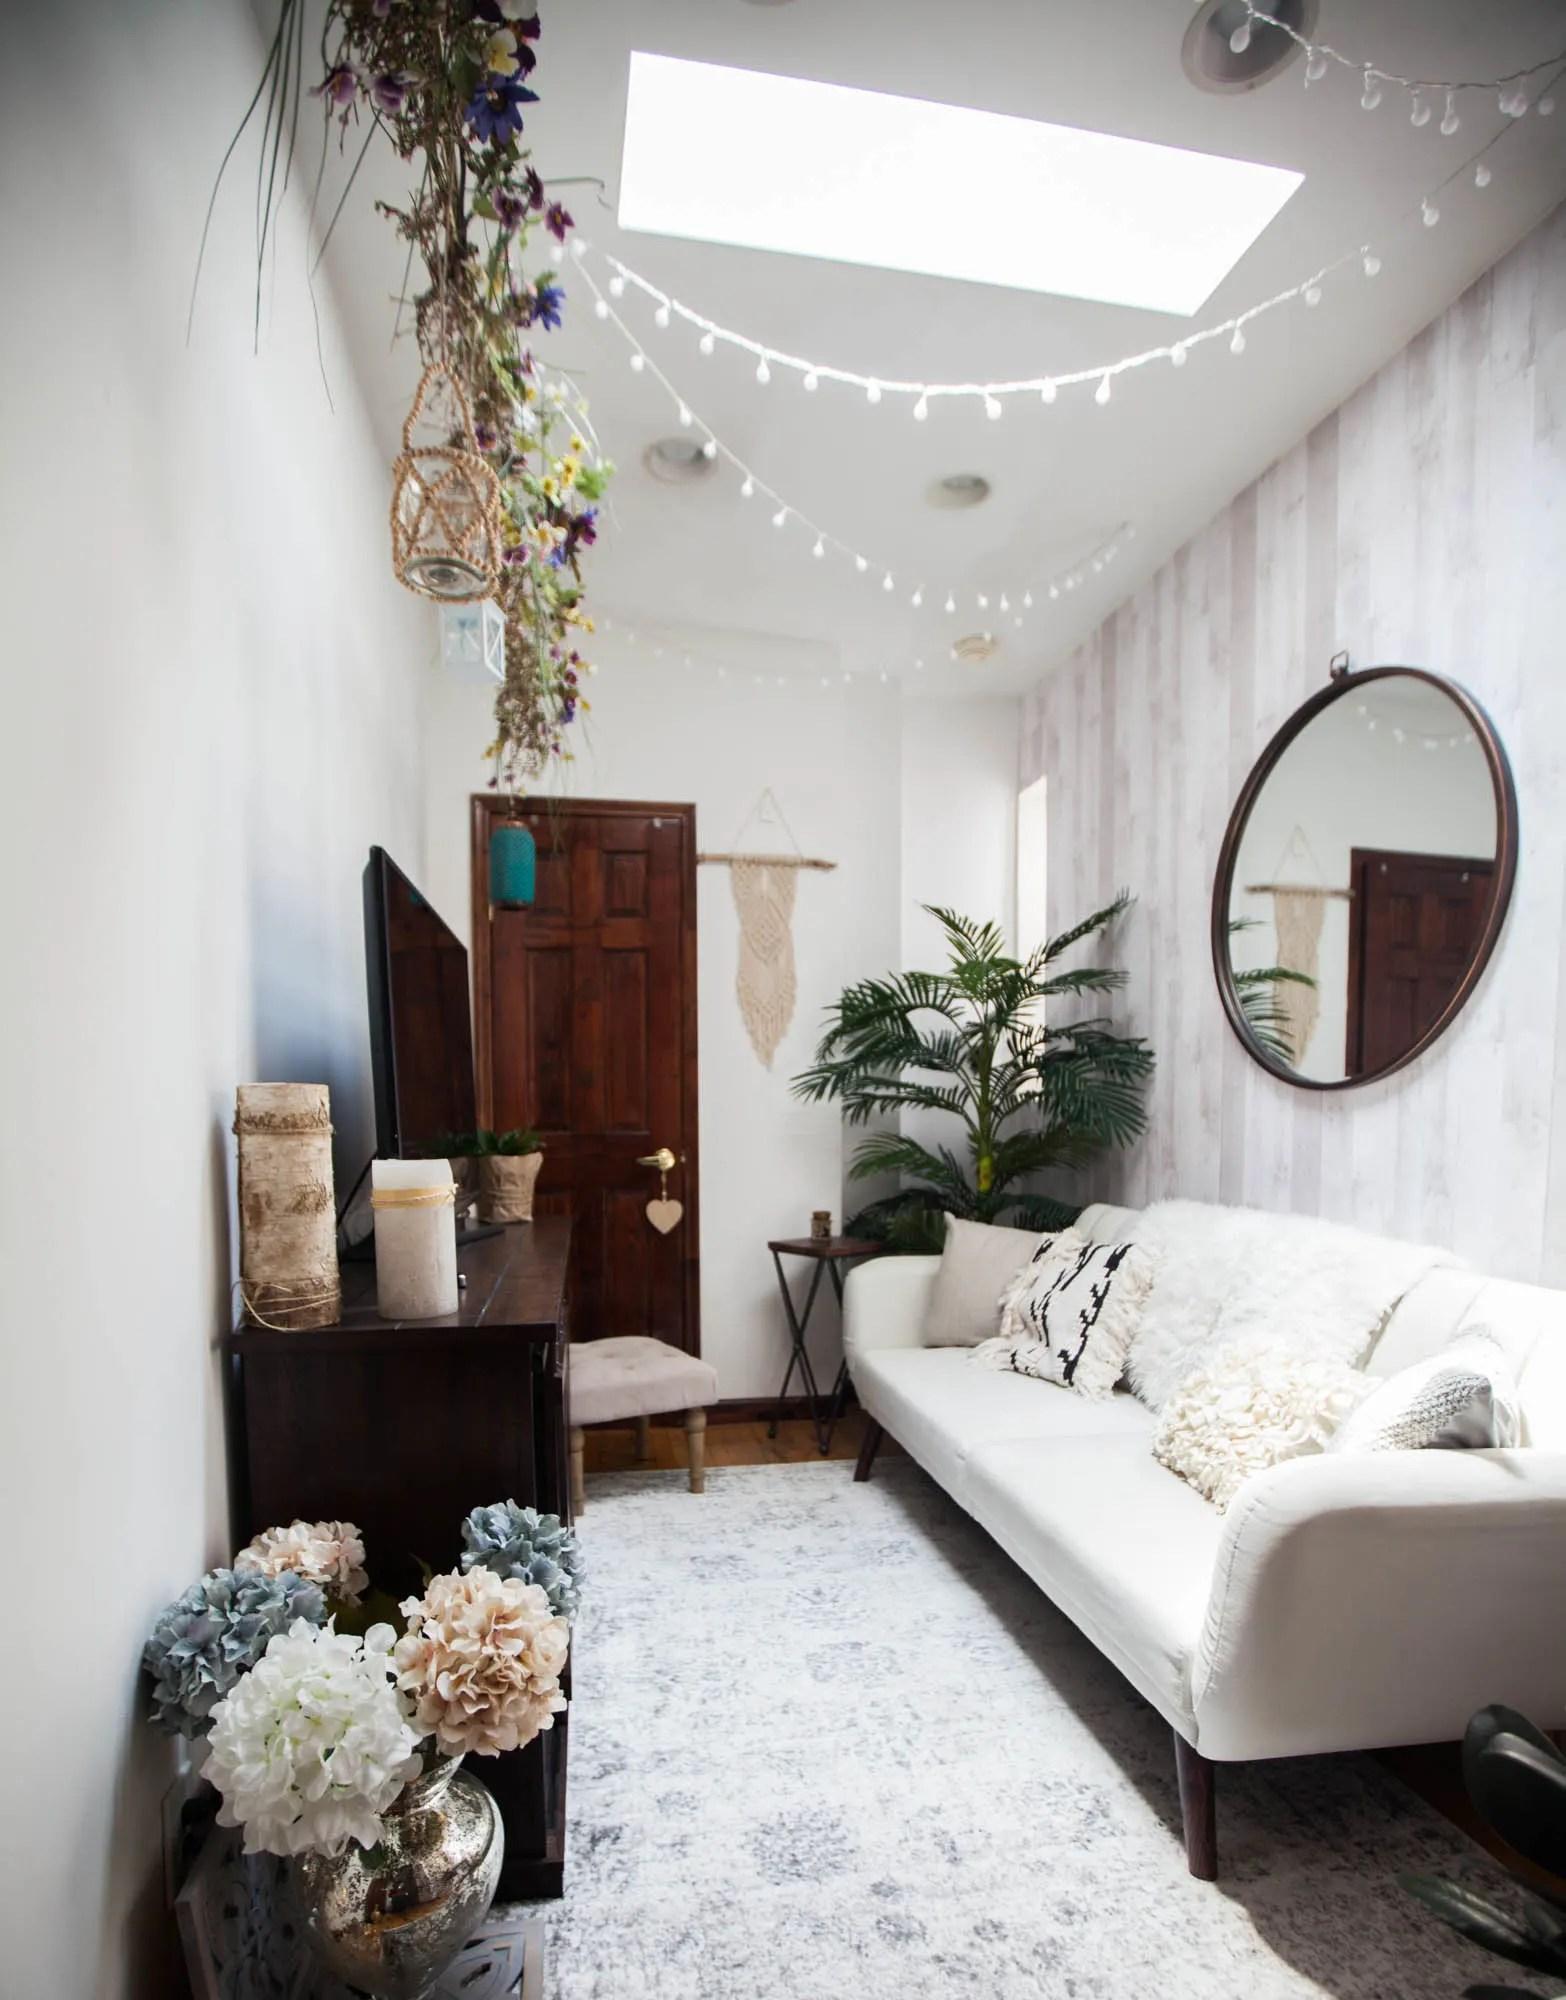 Best Small Living Room Design Ideas | Apartment Therapy on Small Living Room Decorating Ideas  id=97000